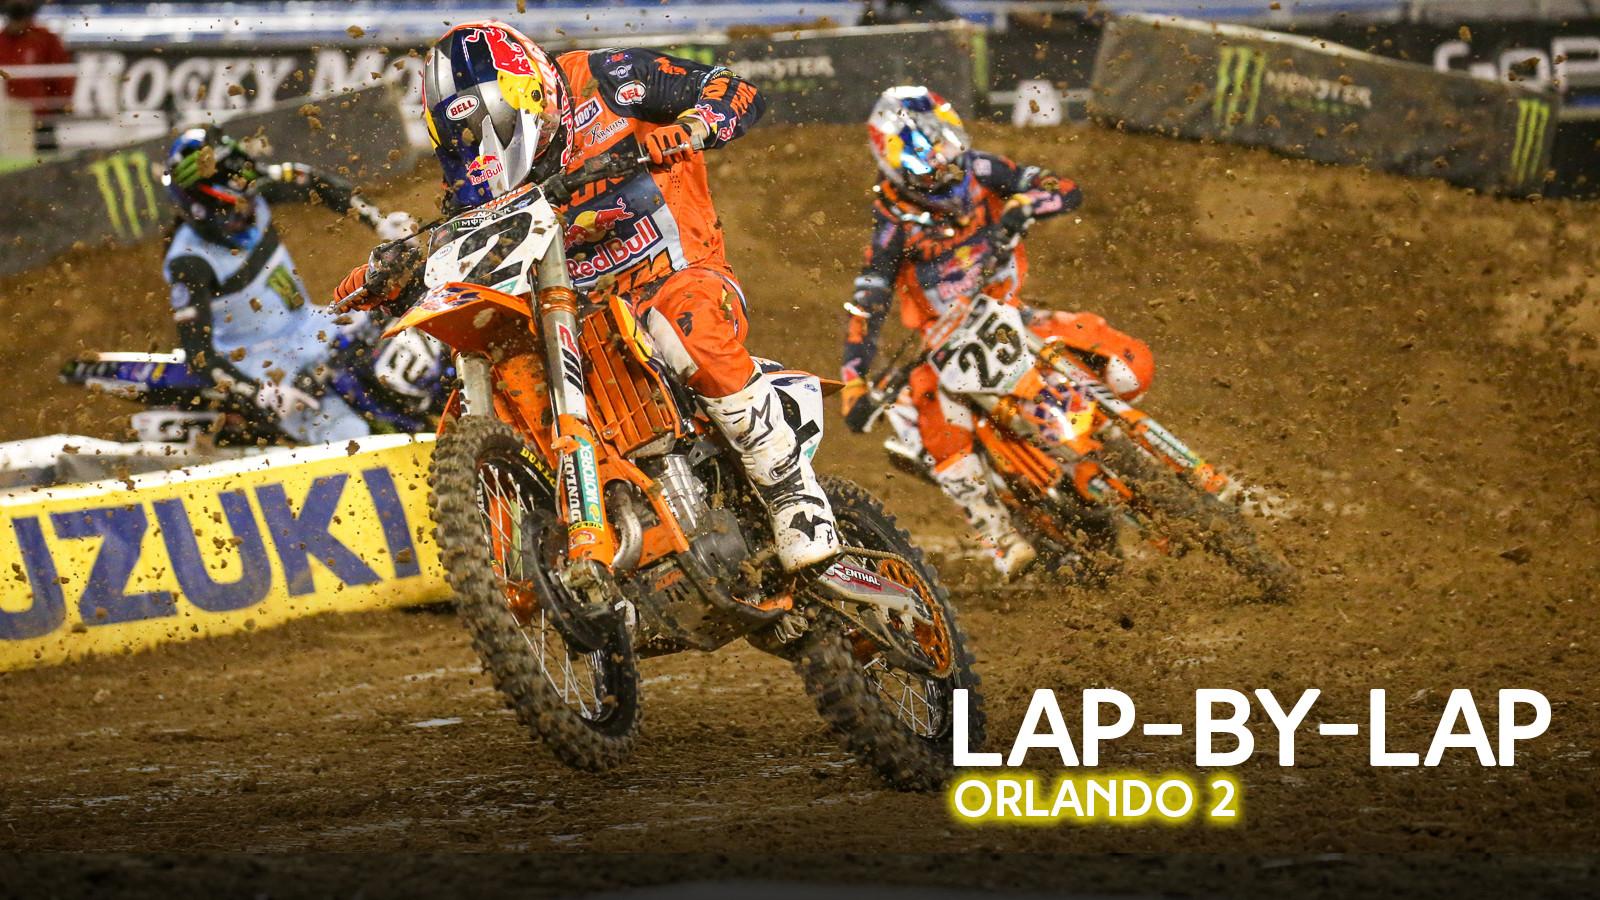 Lap-By-Lap: Orlando 2